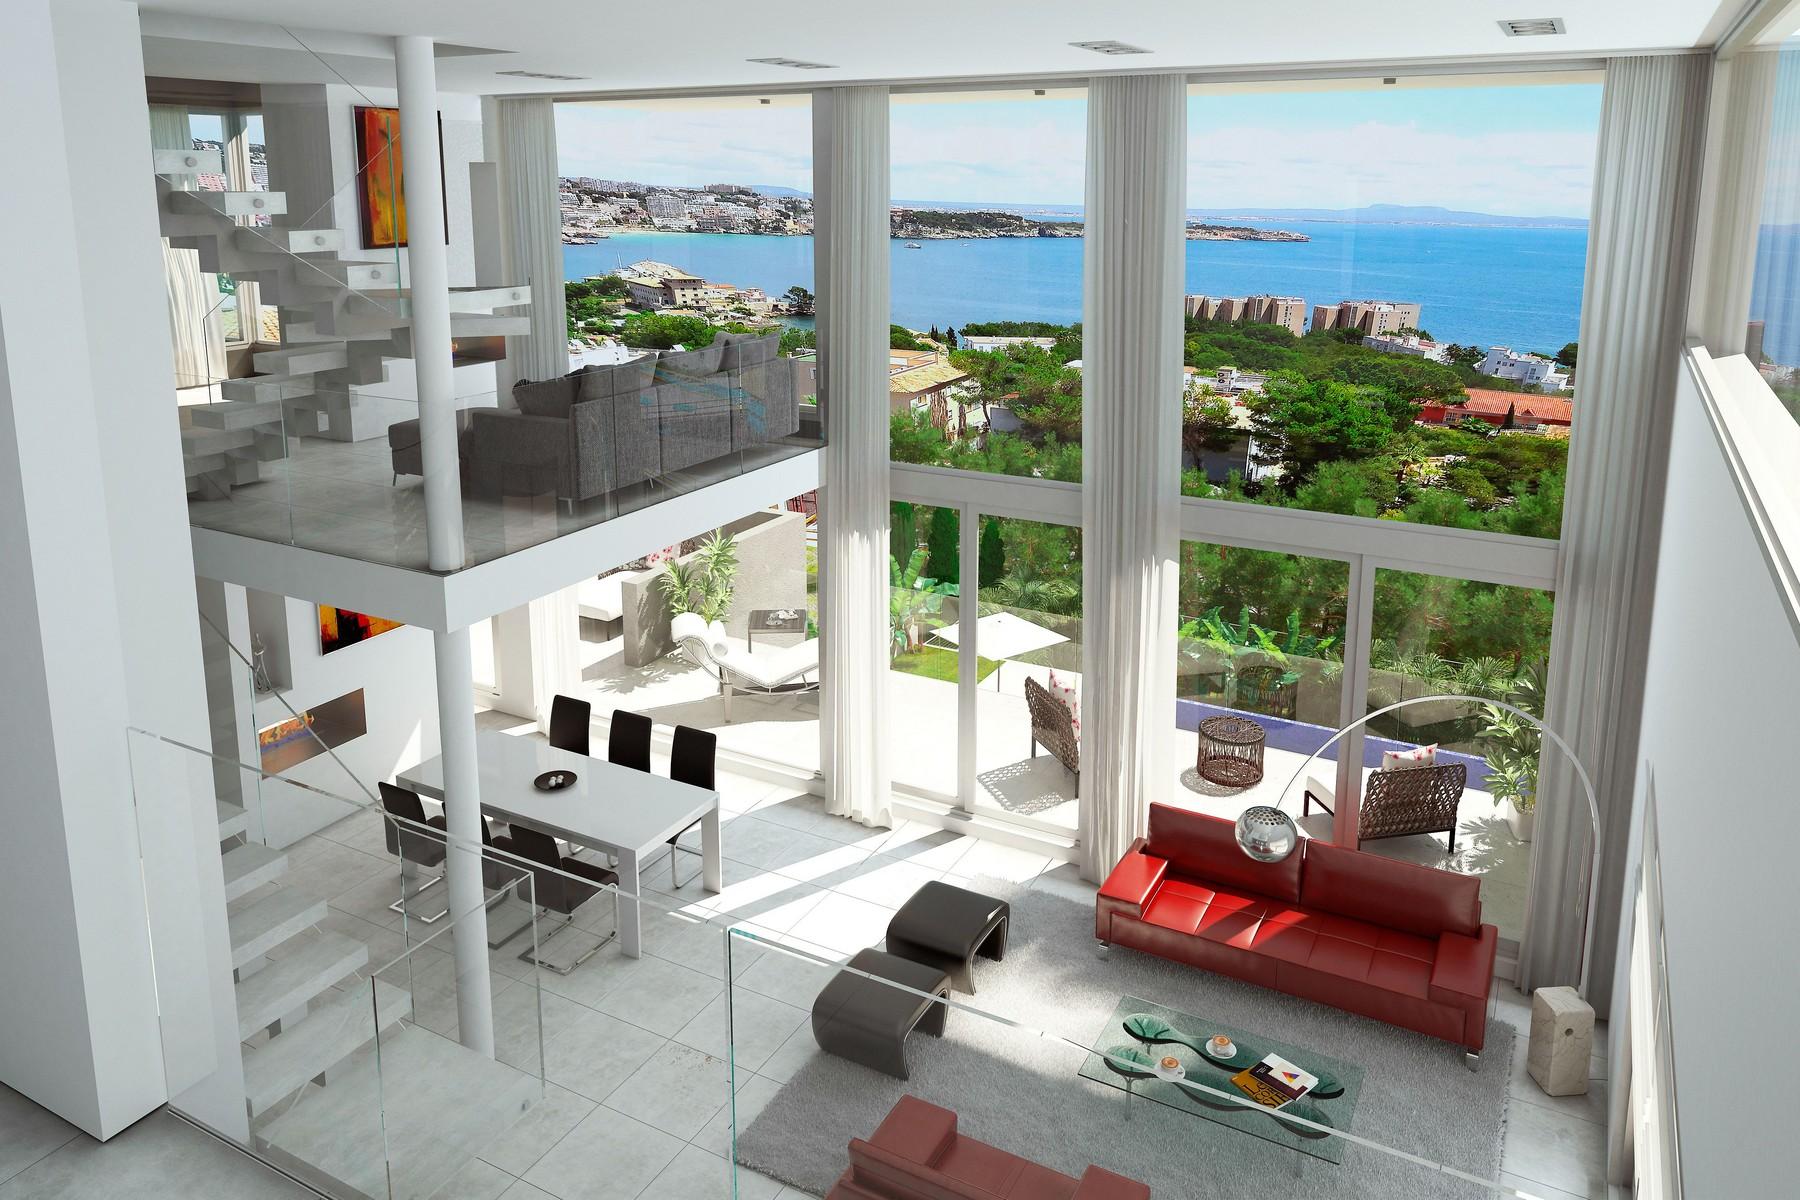 Single Family Home for Sale at Seaview penthouse in Cas Catalá Nou Bendinat, Mallorca 07181 Spain